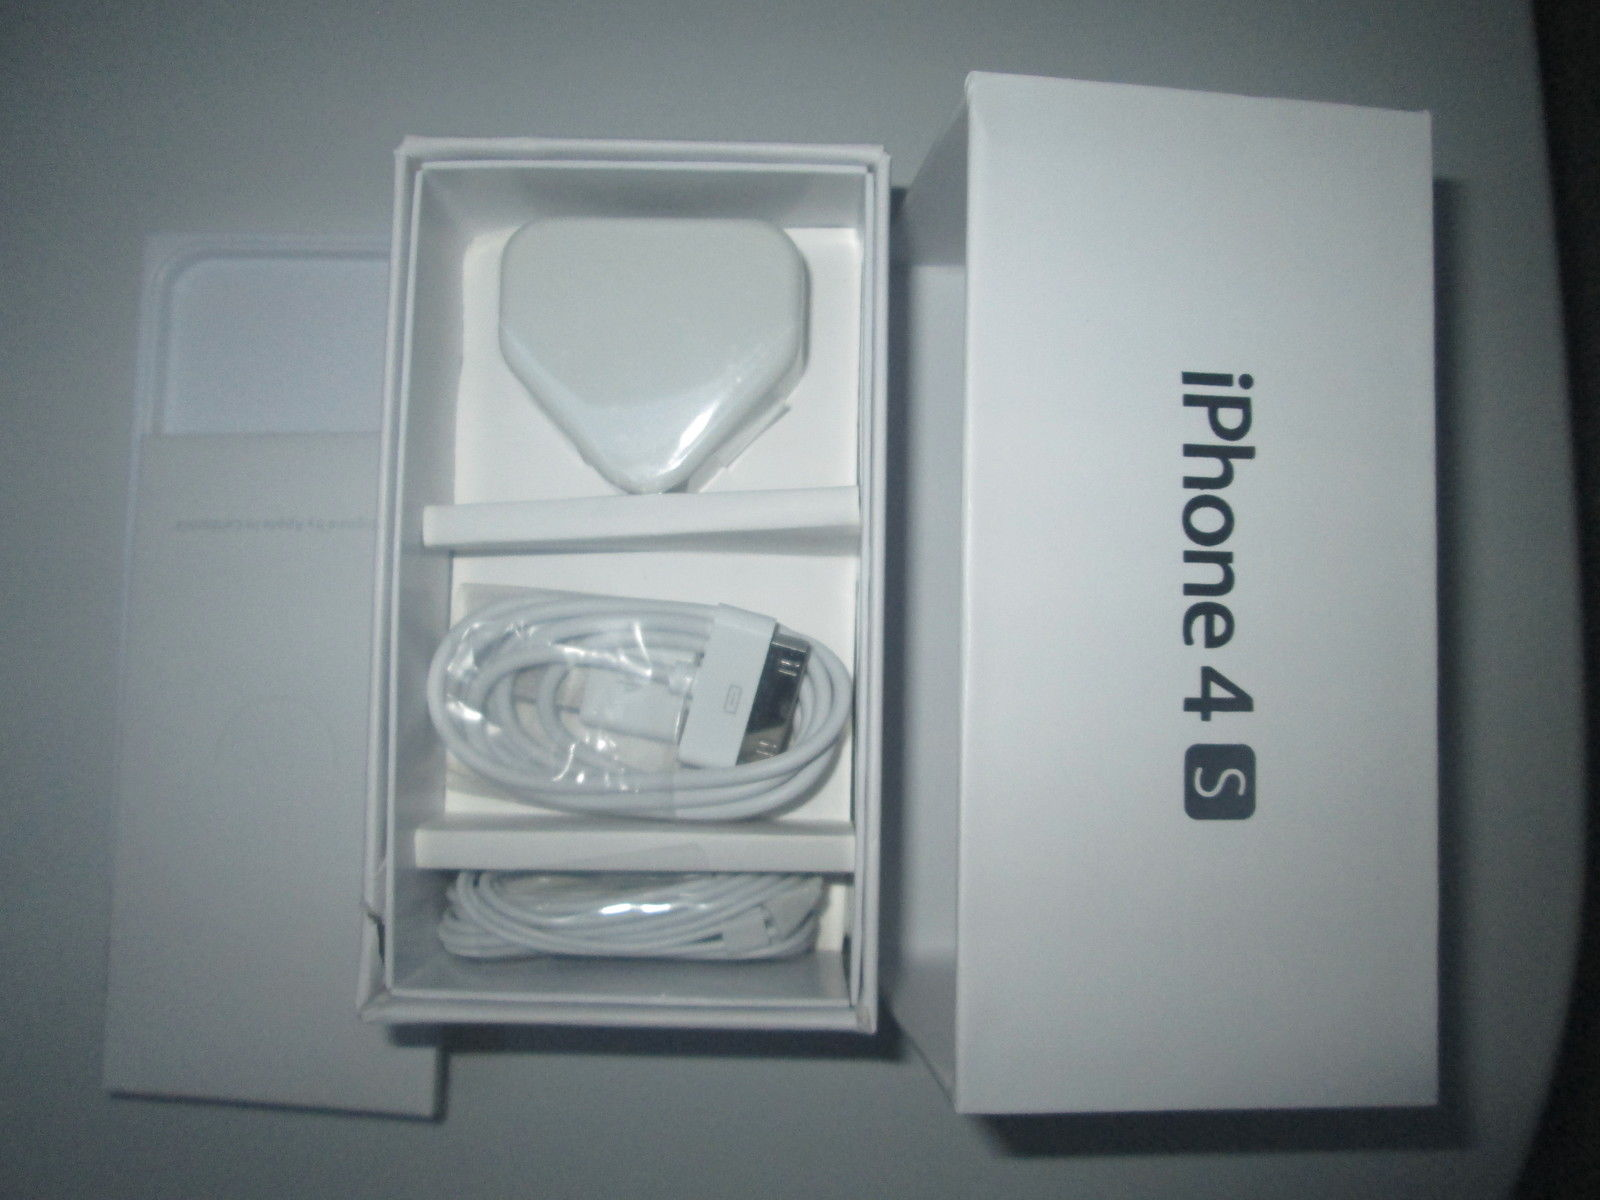 iPhone 4s Black Box